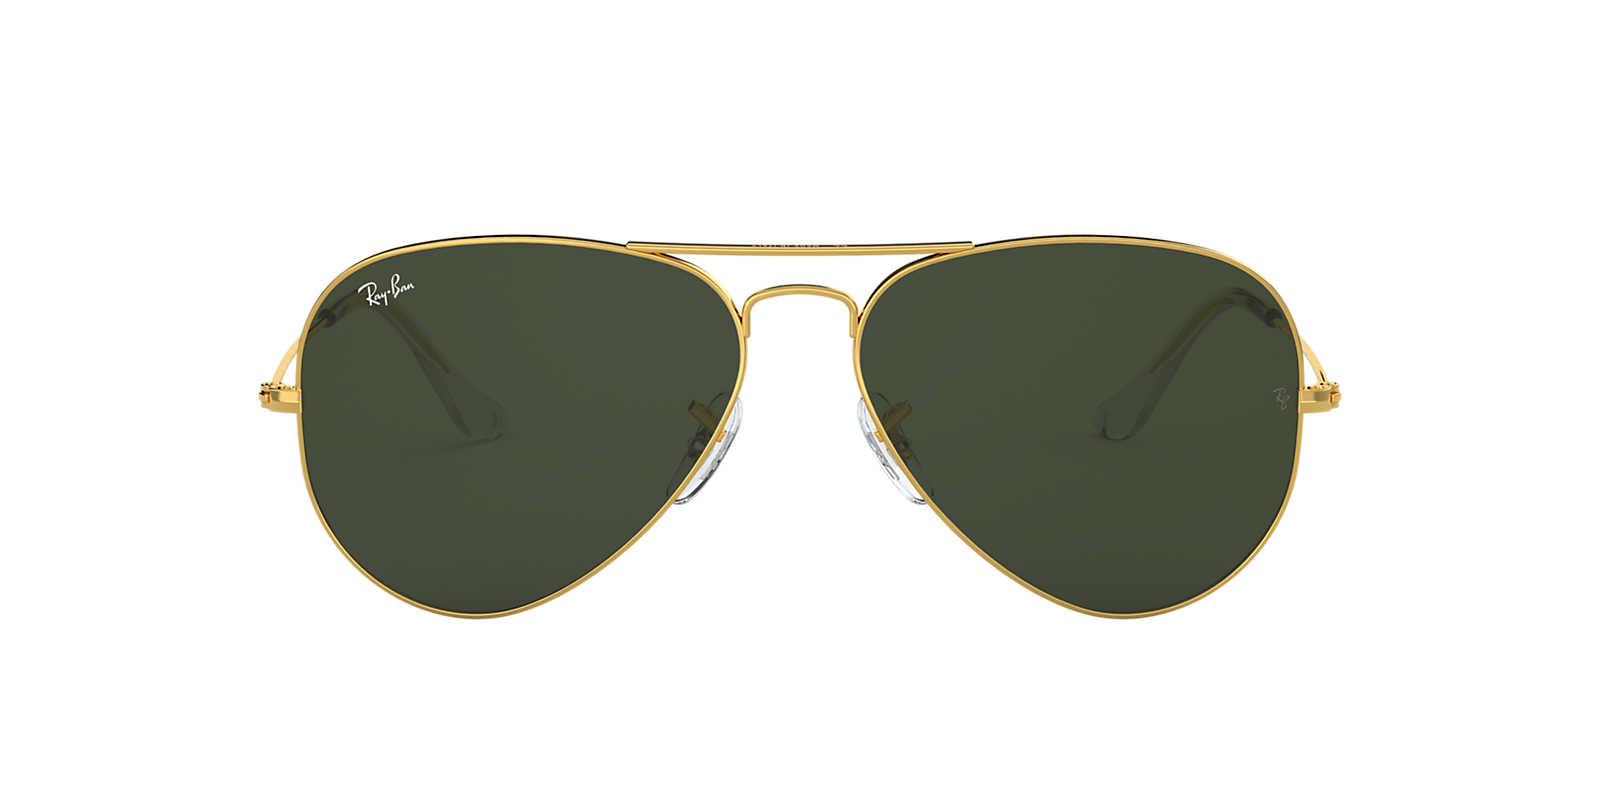 RAY-BAN Gold RB3025 55 ORIGINAL AVIATOR Green lenses 55mm